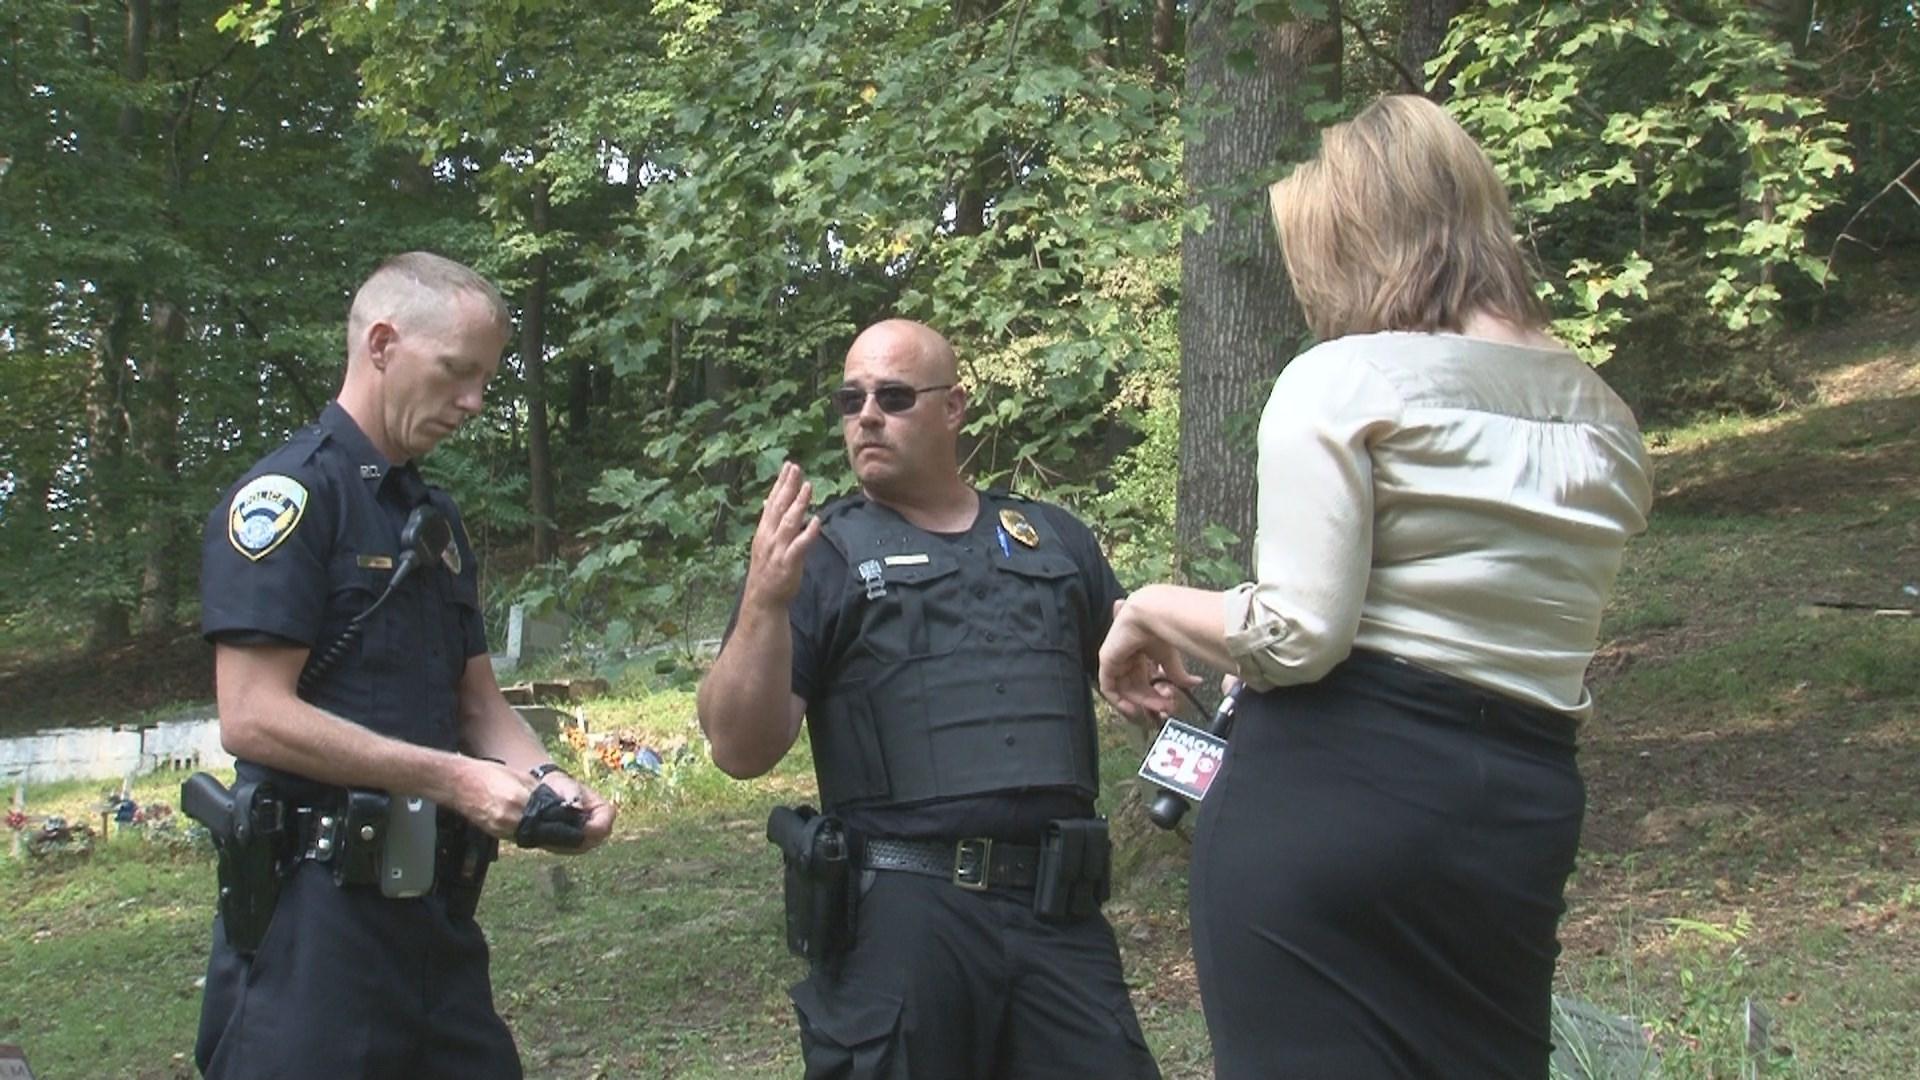 Officers find discarded drug paraphanalia in a Cedar Grove cemetery.